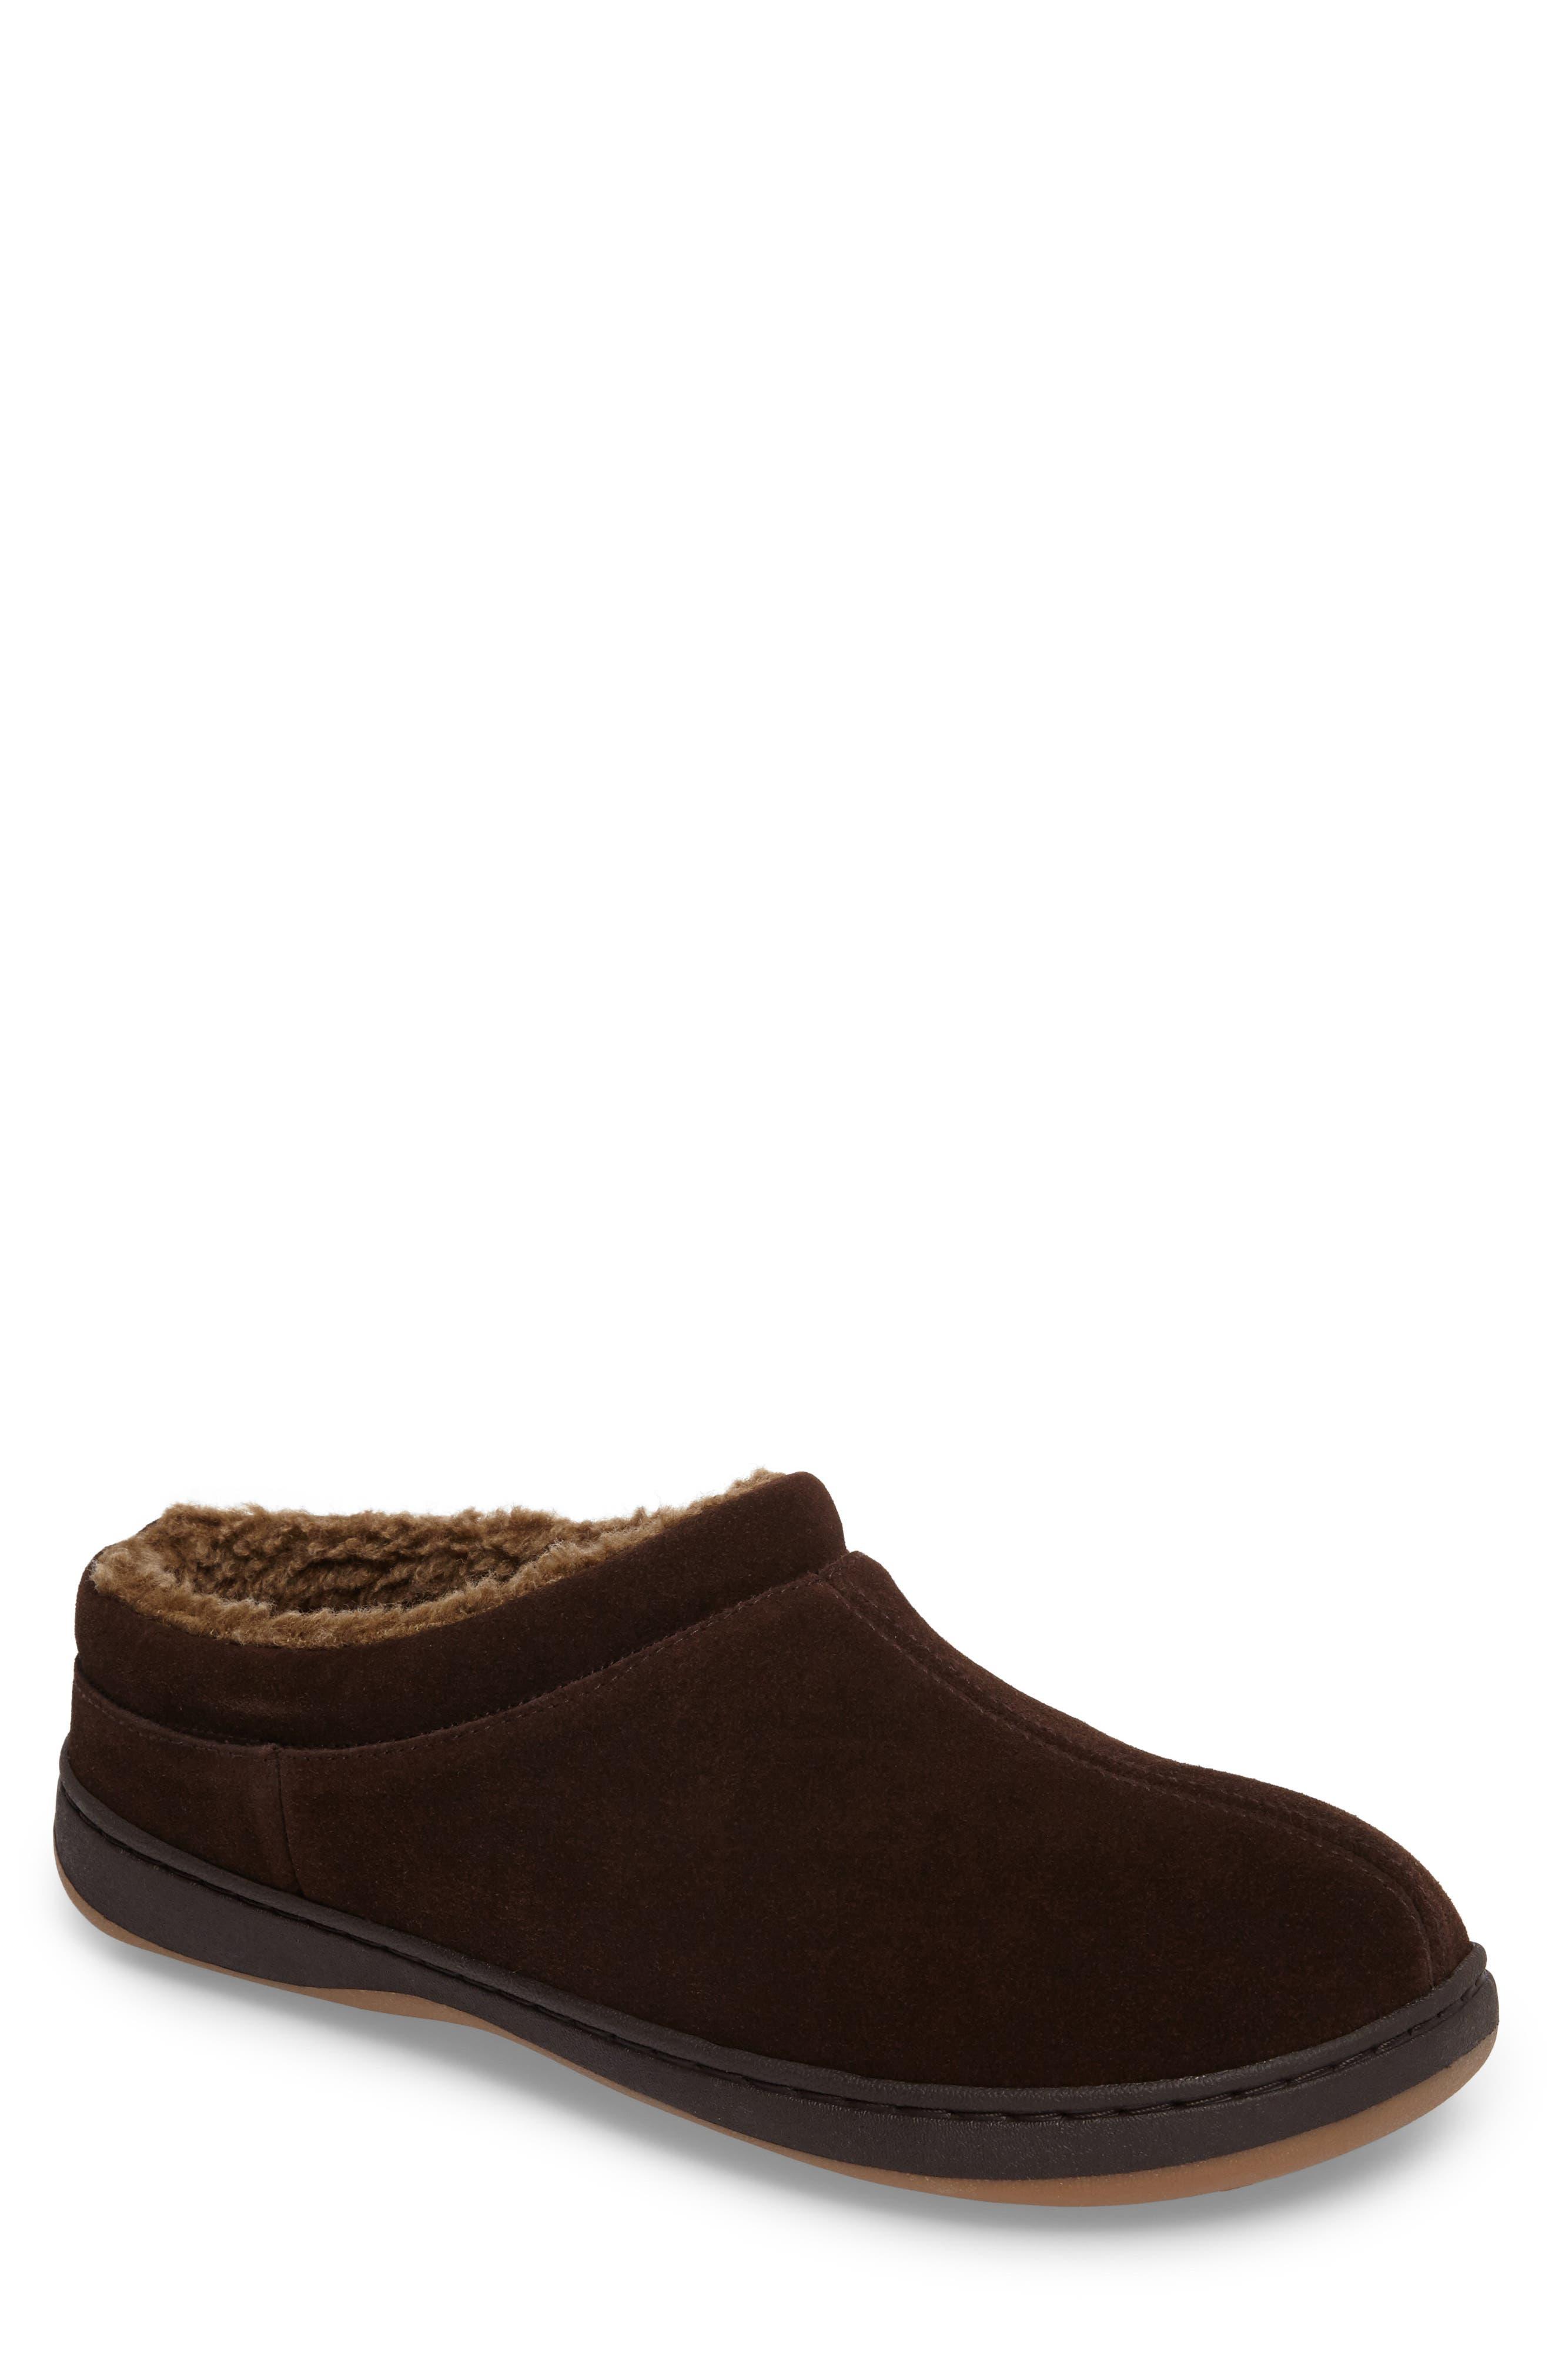 Men's Slip-On Slippers \u0026 Moccasins